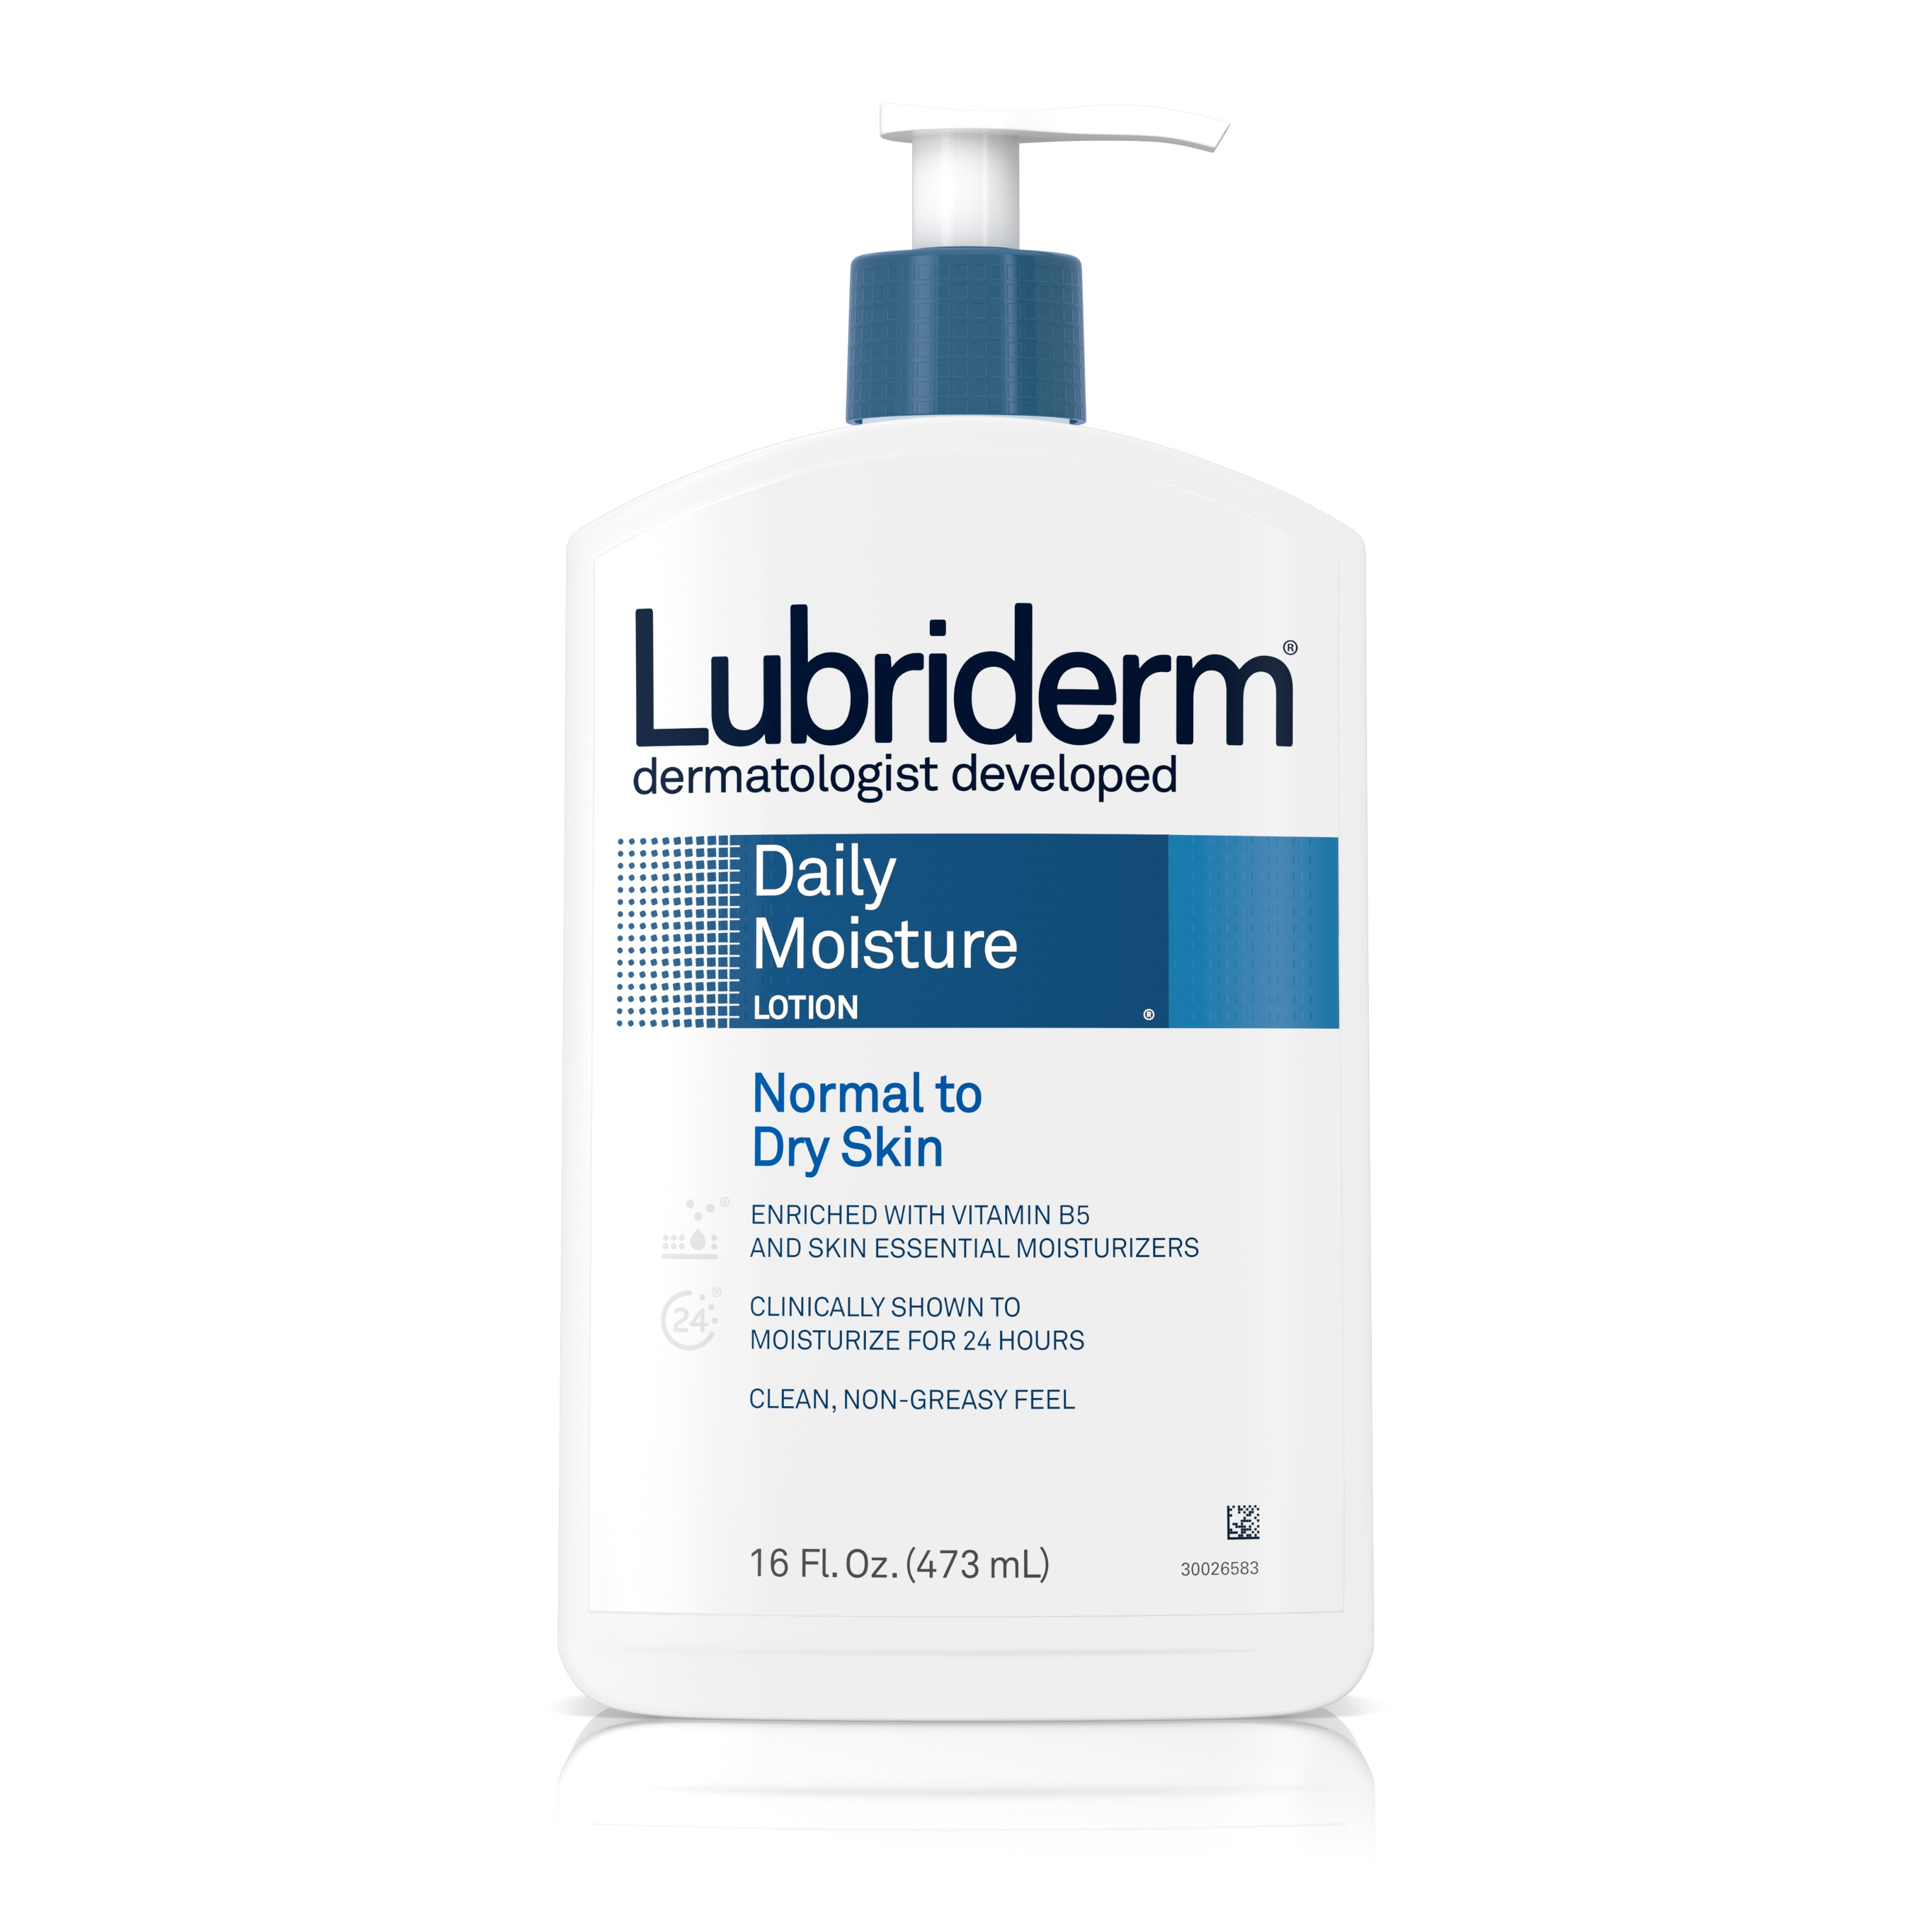 Lubriderm Daily Moisture Hydrating Lotion with Vitamin B5, 16 fl. oz